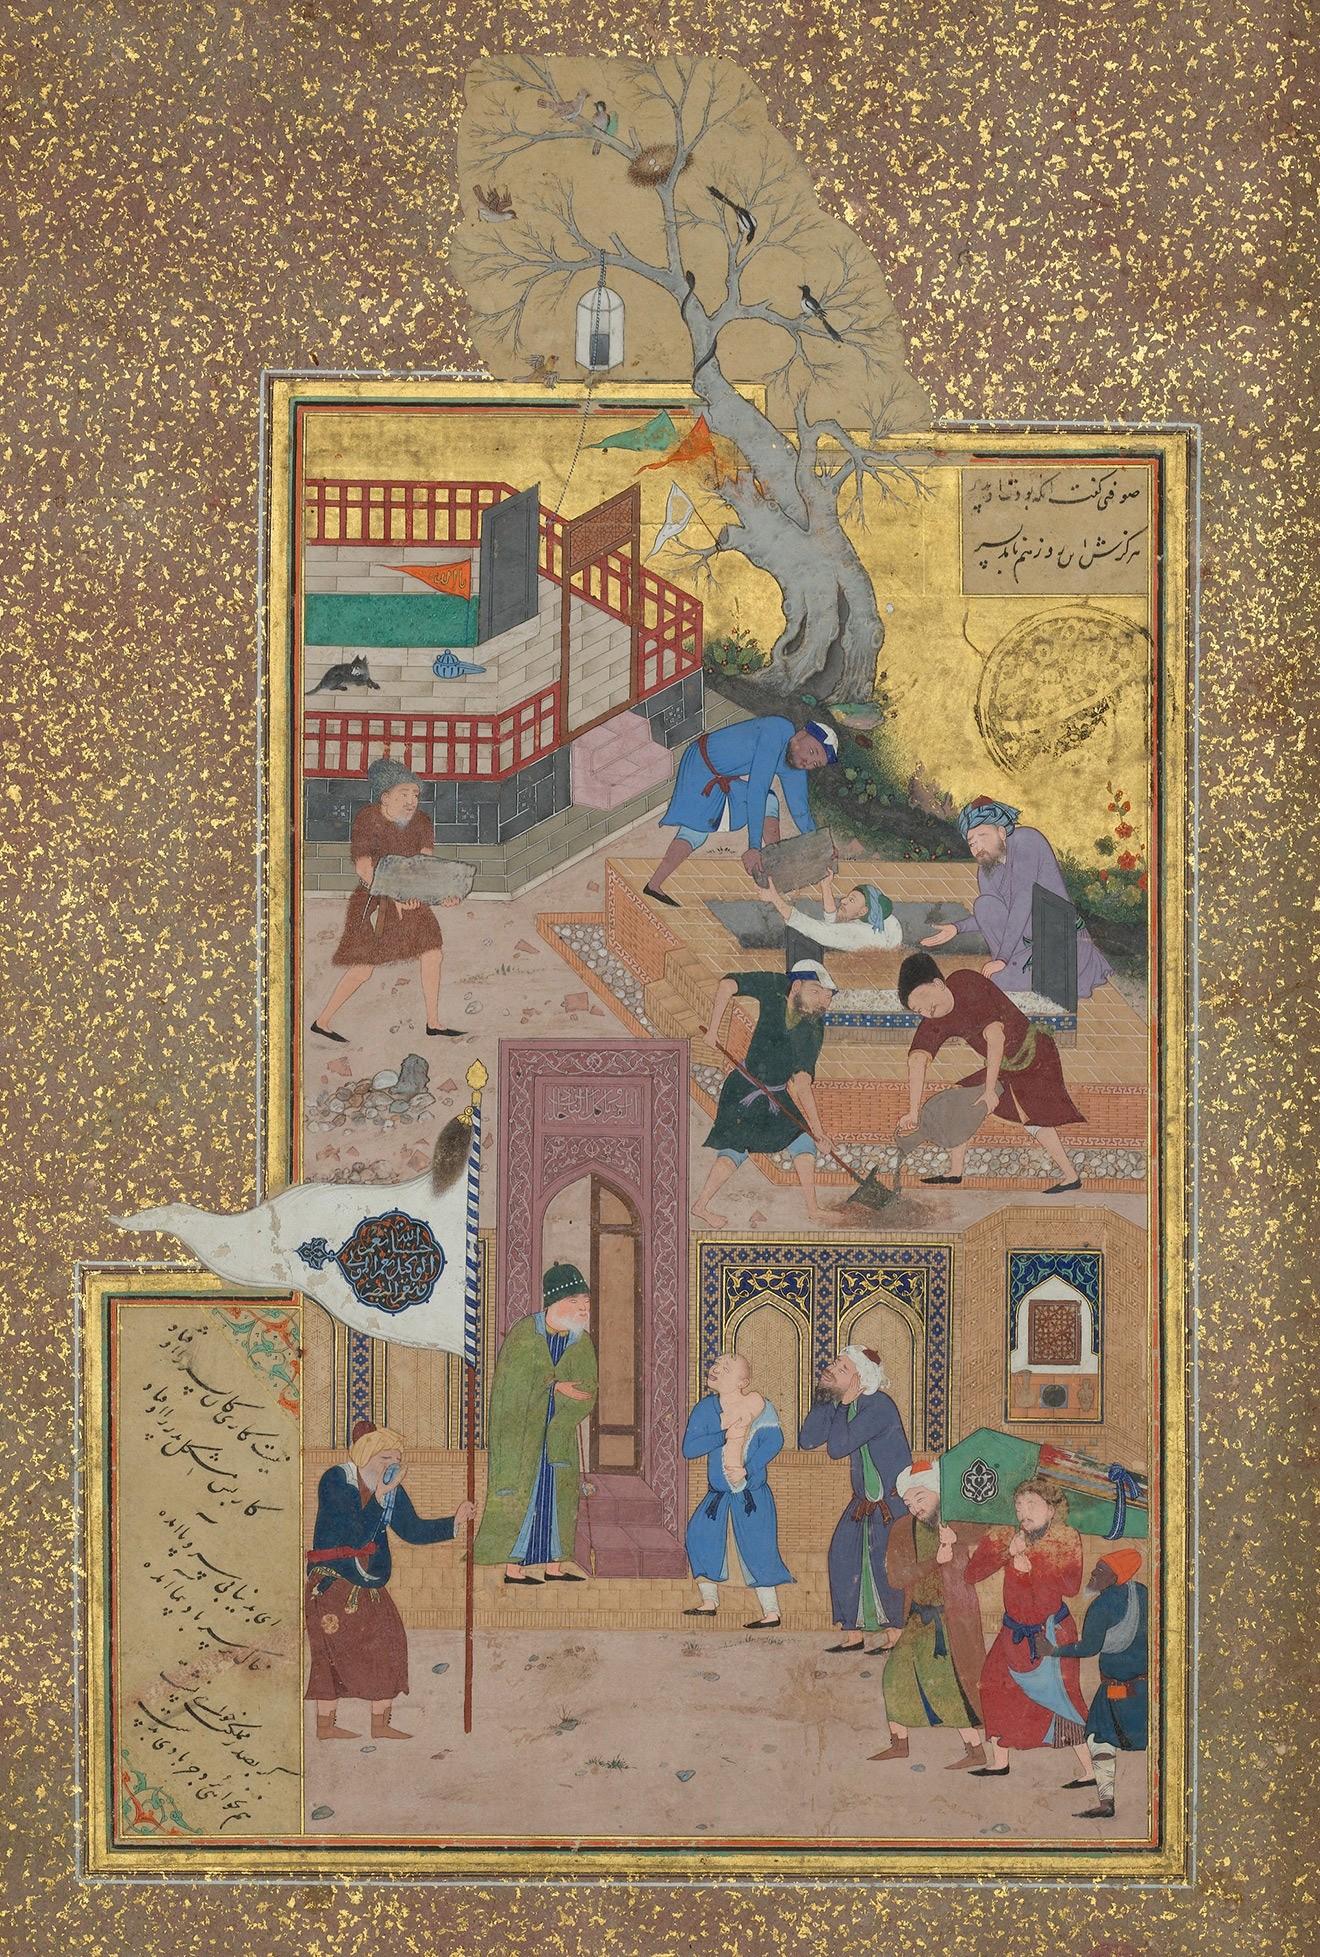 Бехзад. Похоронная процессия. Миниатюра из «Мантик ат-Тайр» Аттара. 1487 годThe Metropolitan Museum of Art